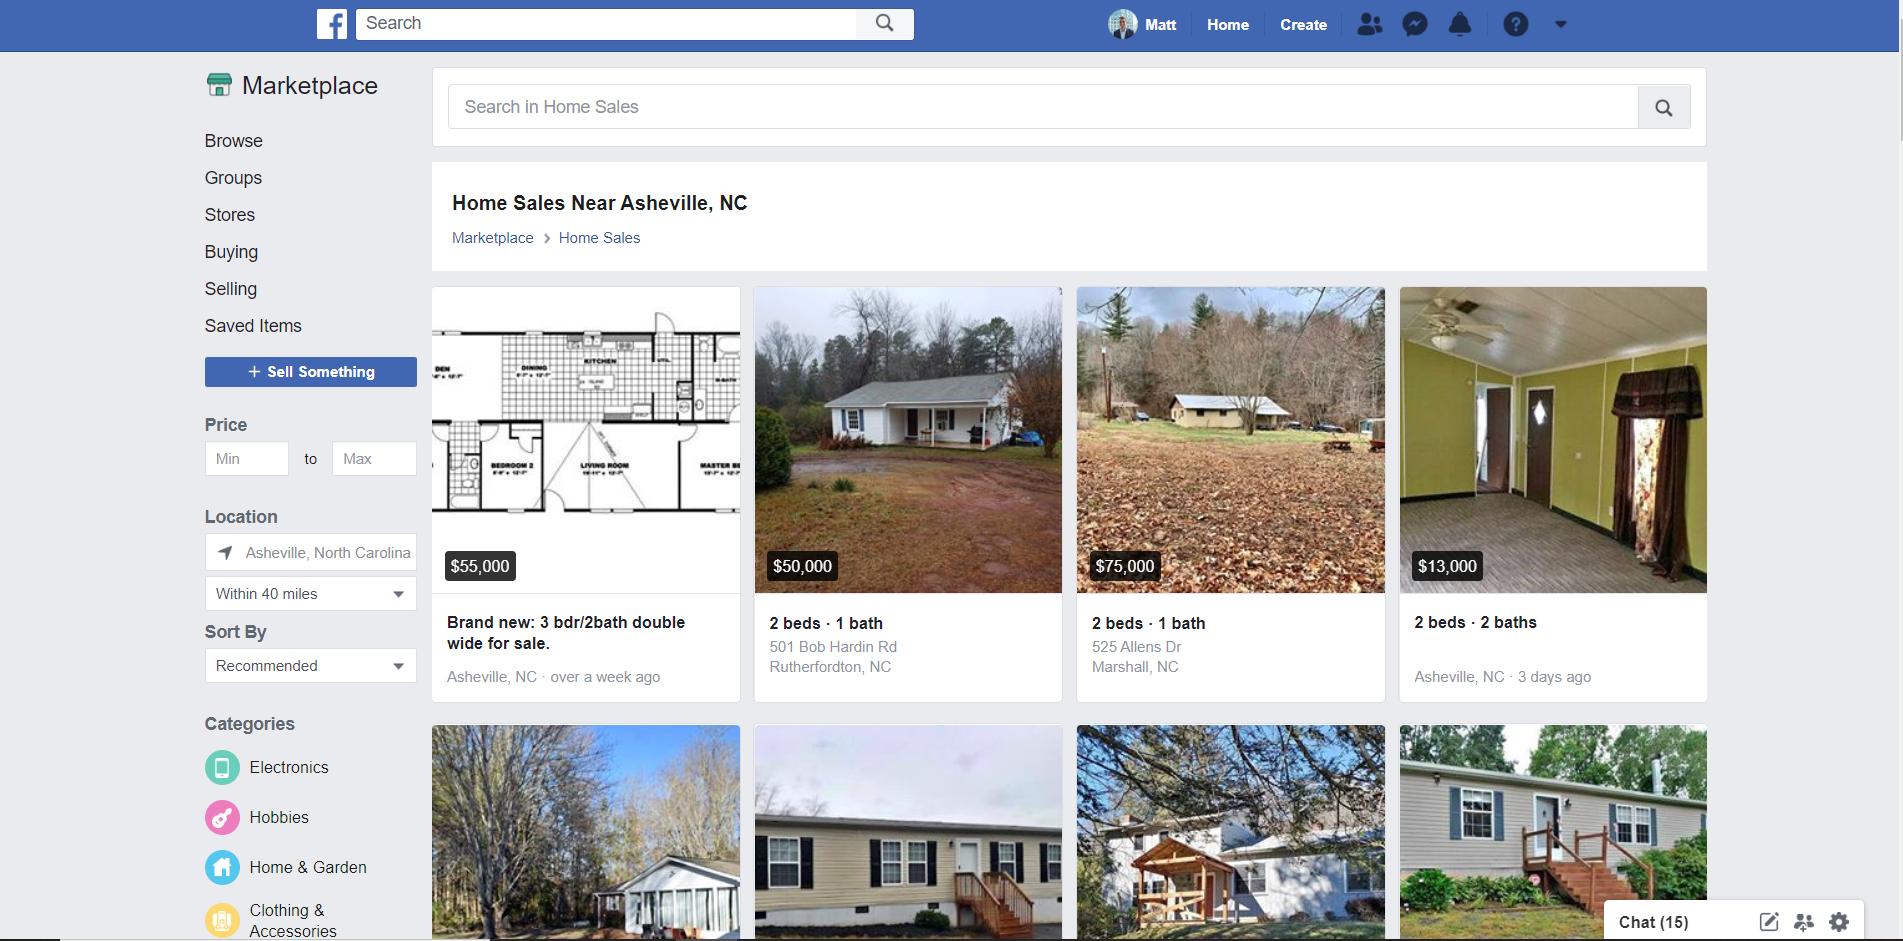 facebook marketplace home sales